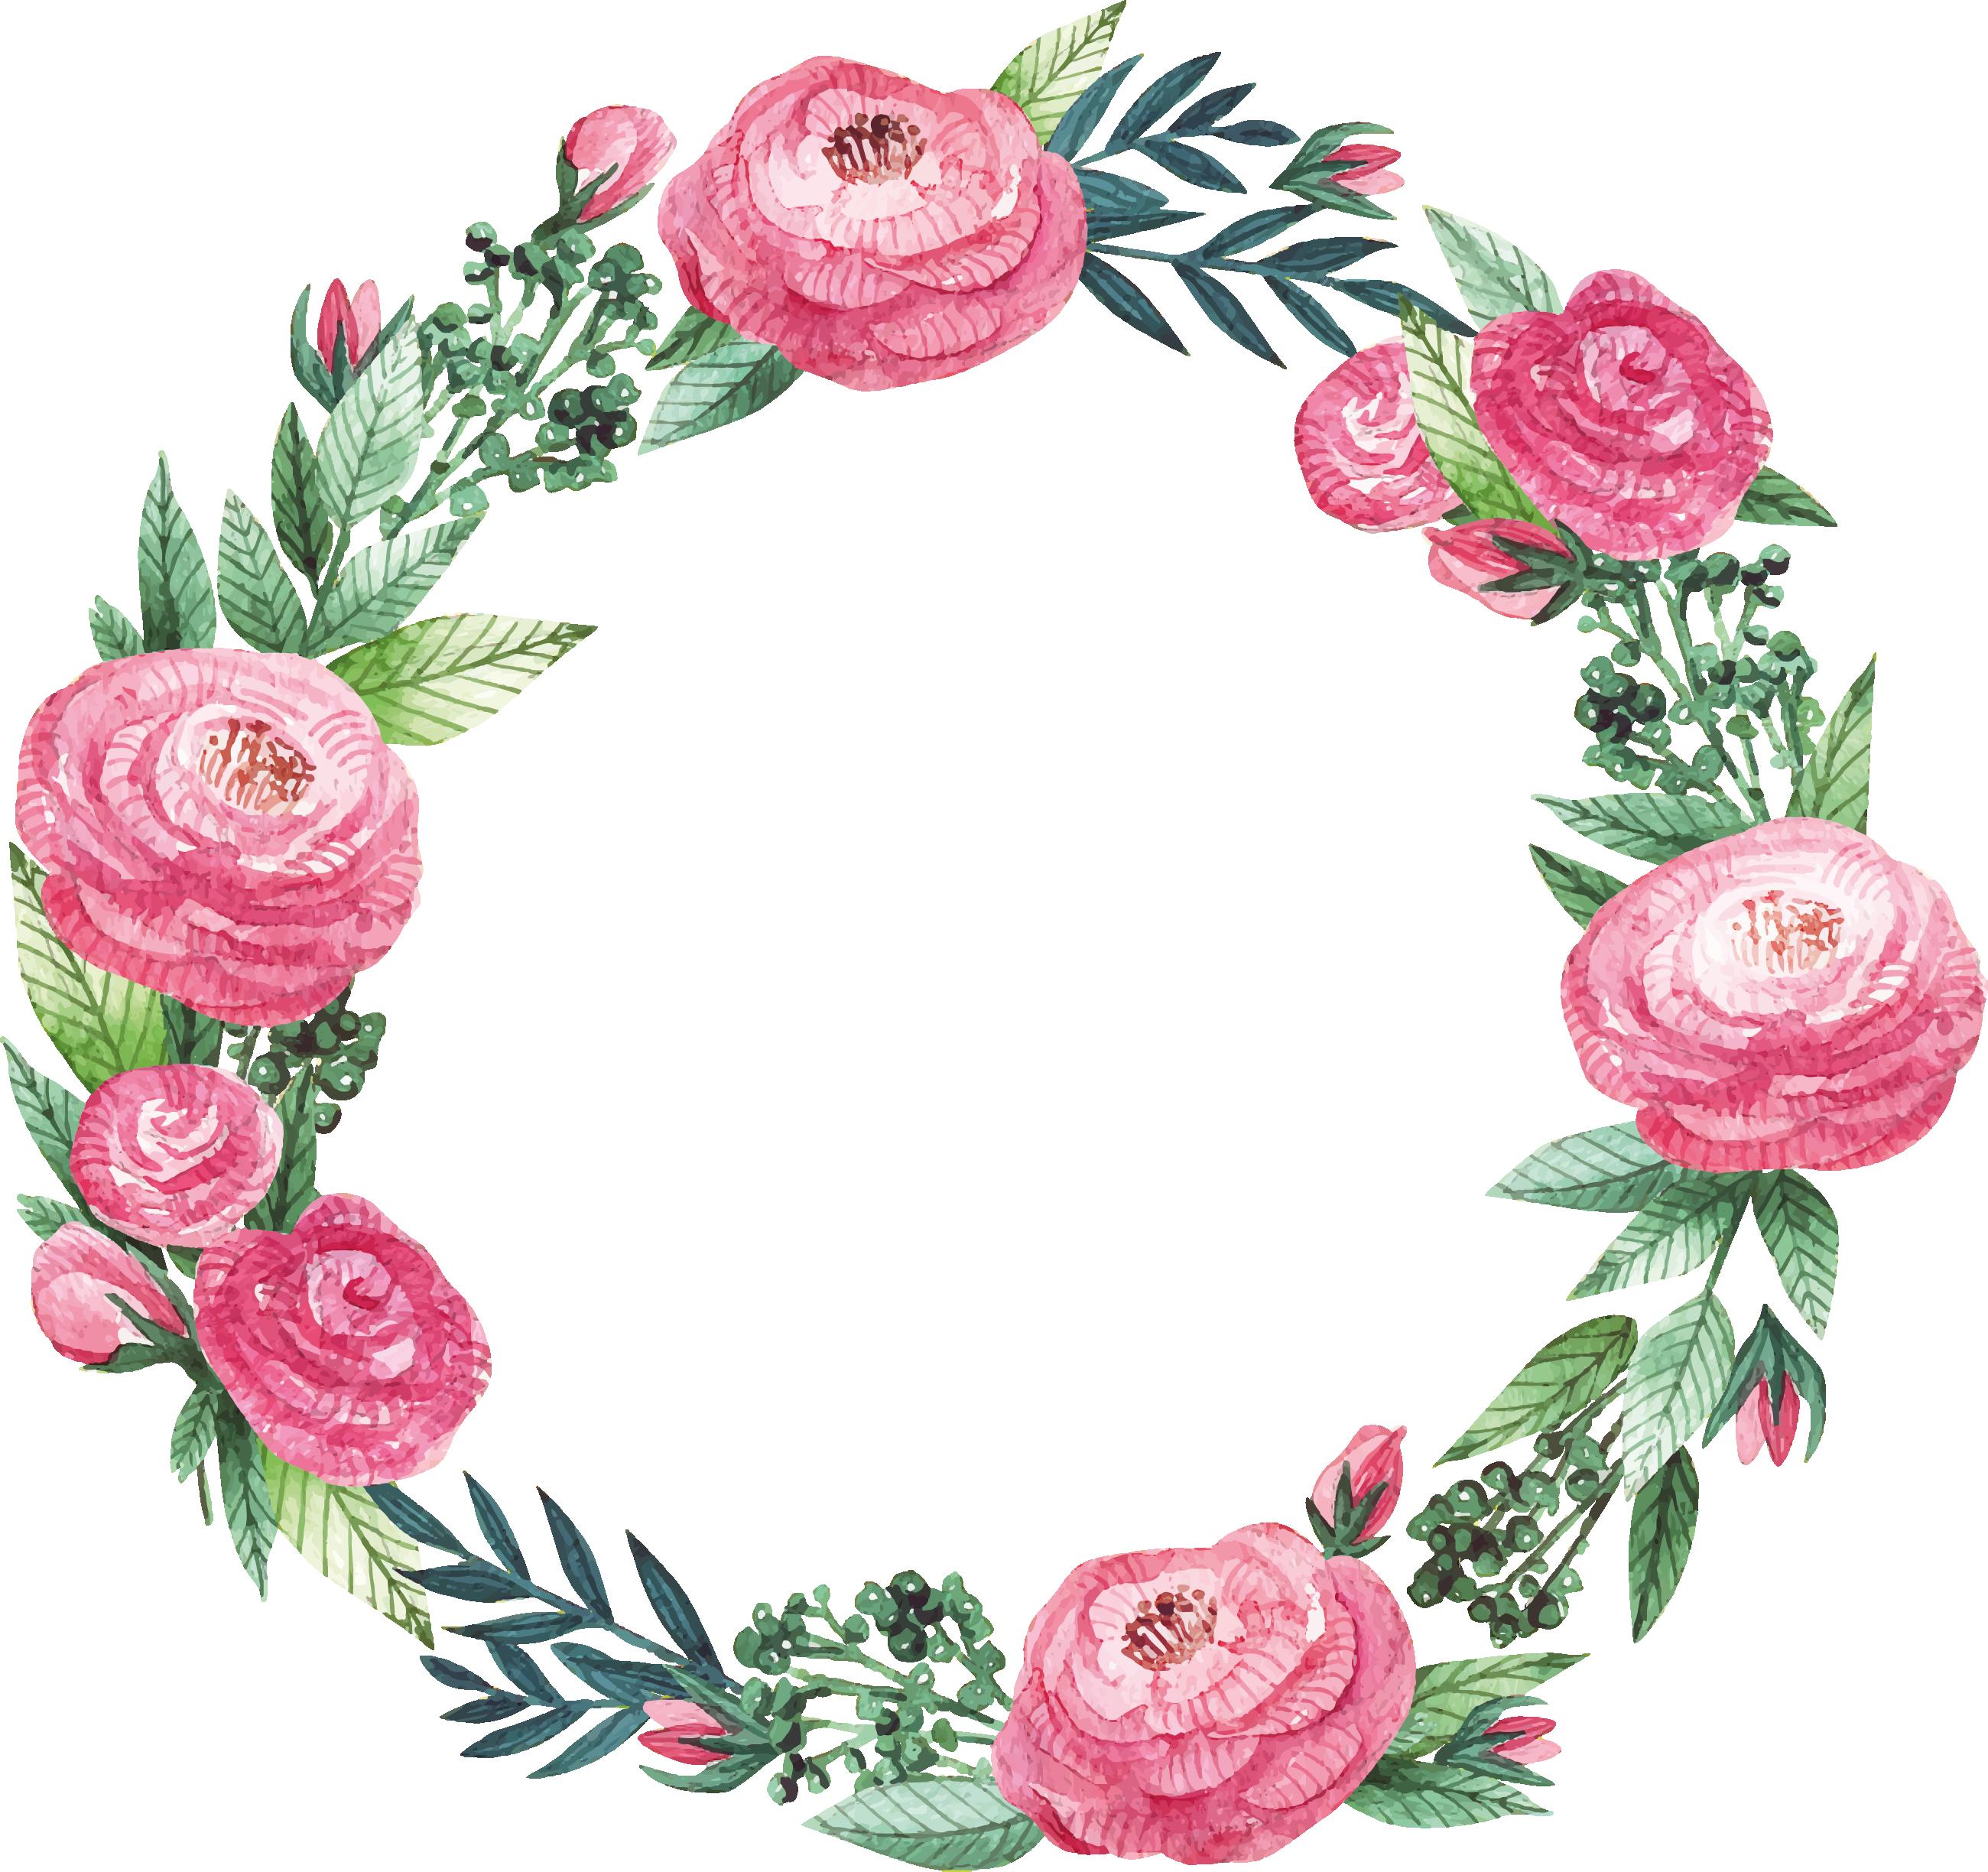 Floral frame png. Clipart il krg clip